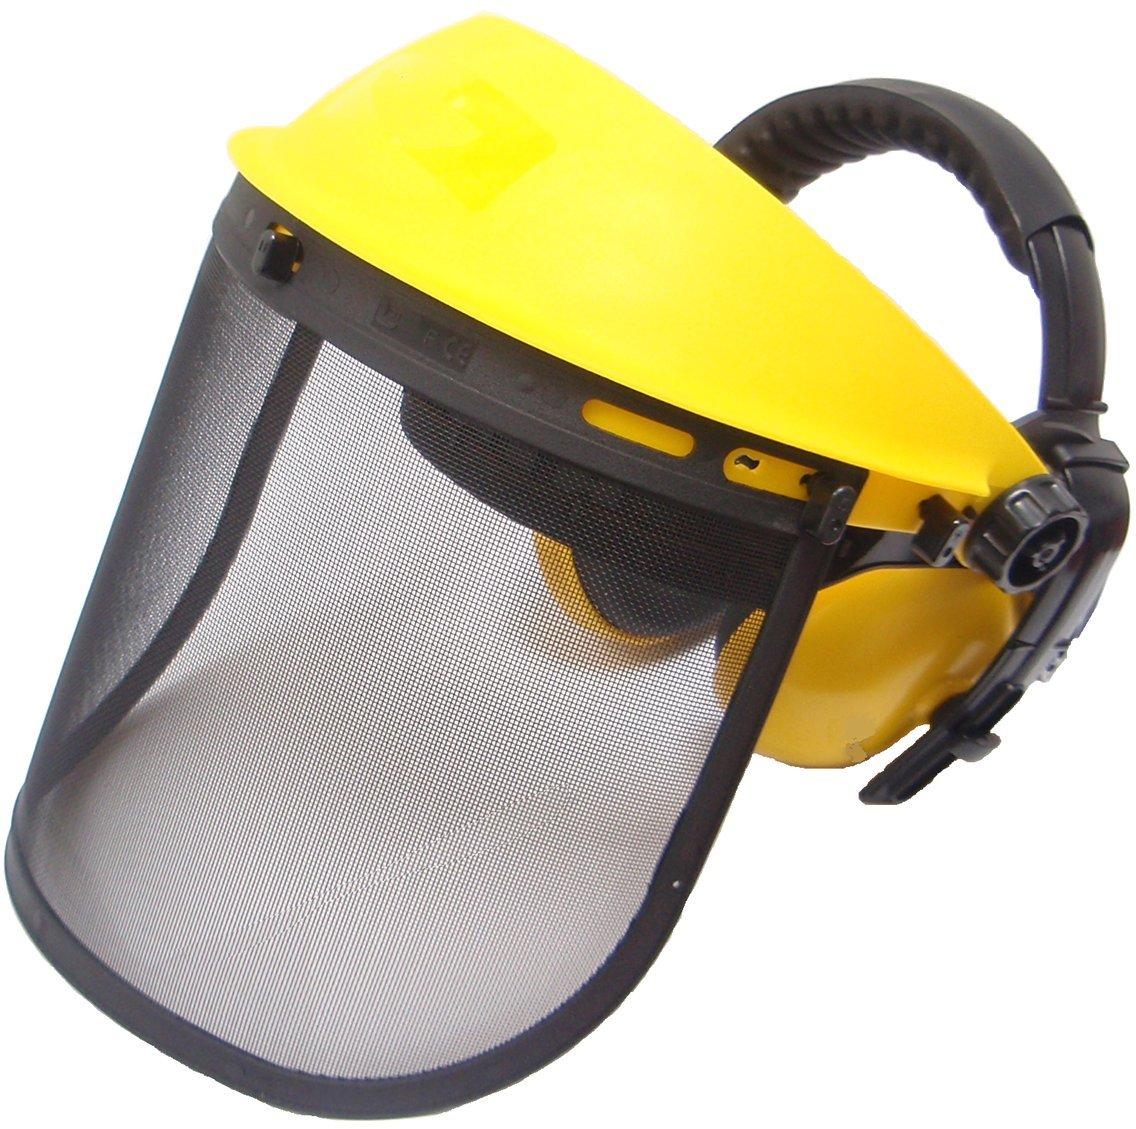 Jasper Browguard Face Shield Mesh Visor with Ear Muffs - ANSI Z87.1 CE EN1731 by Jasper